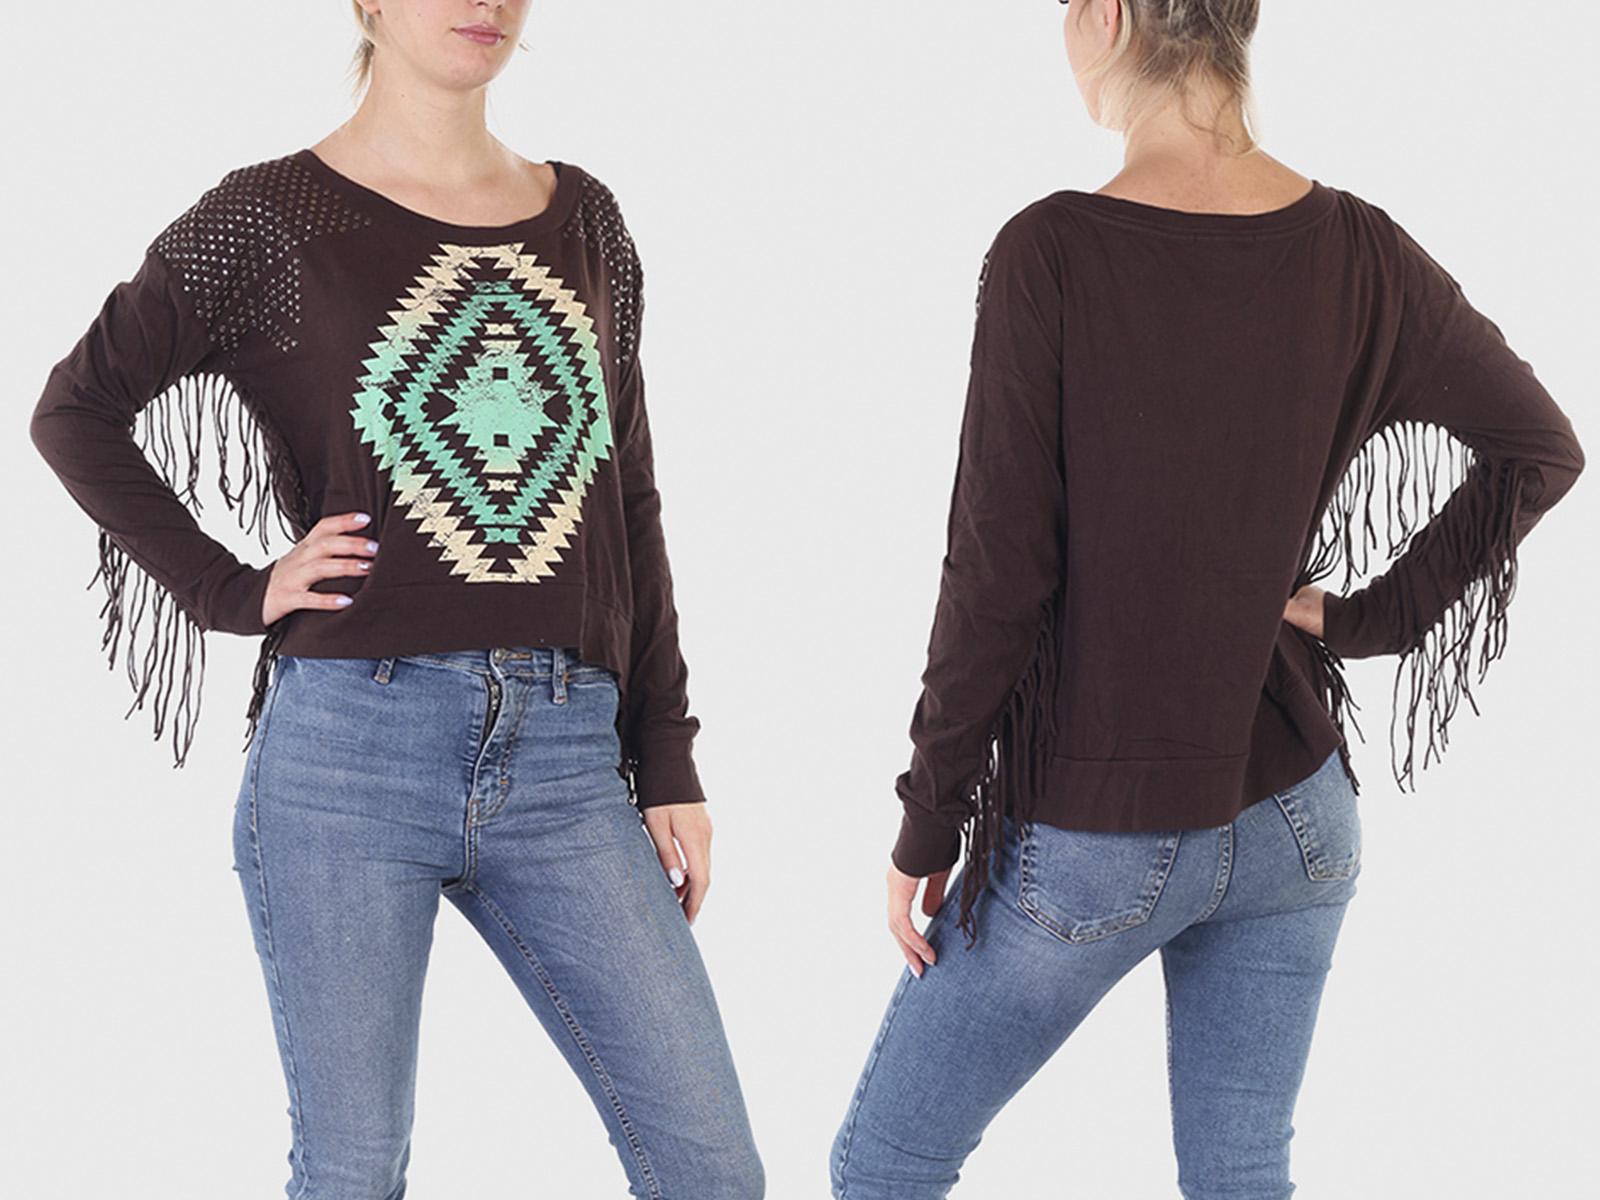 Креативная женская кофта-свитер Rock and Roll Cowgirl